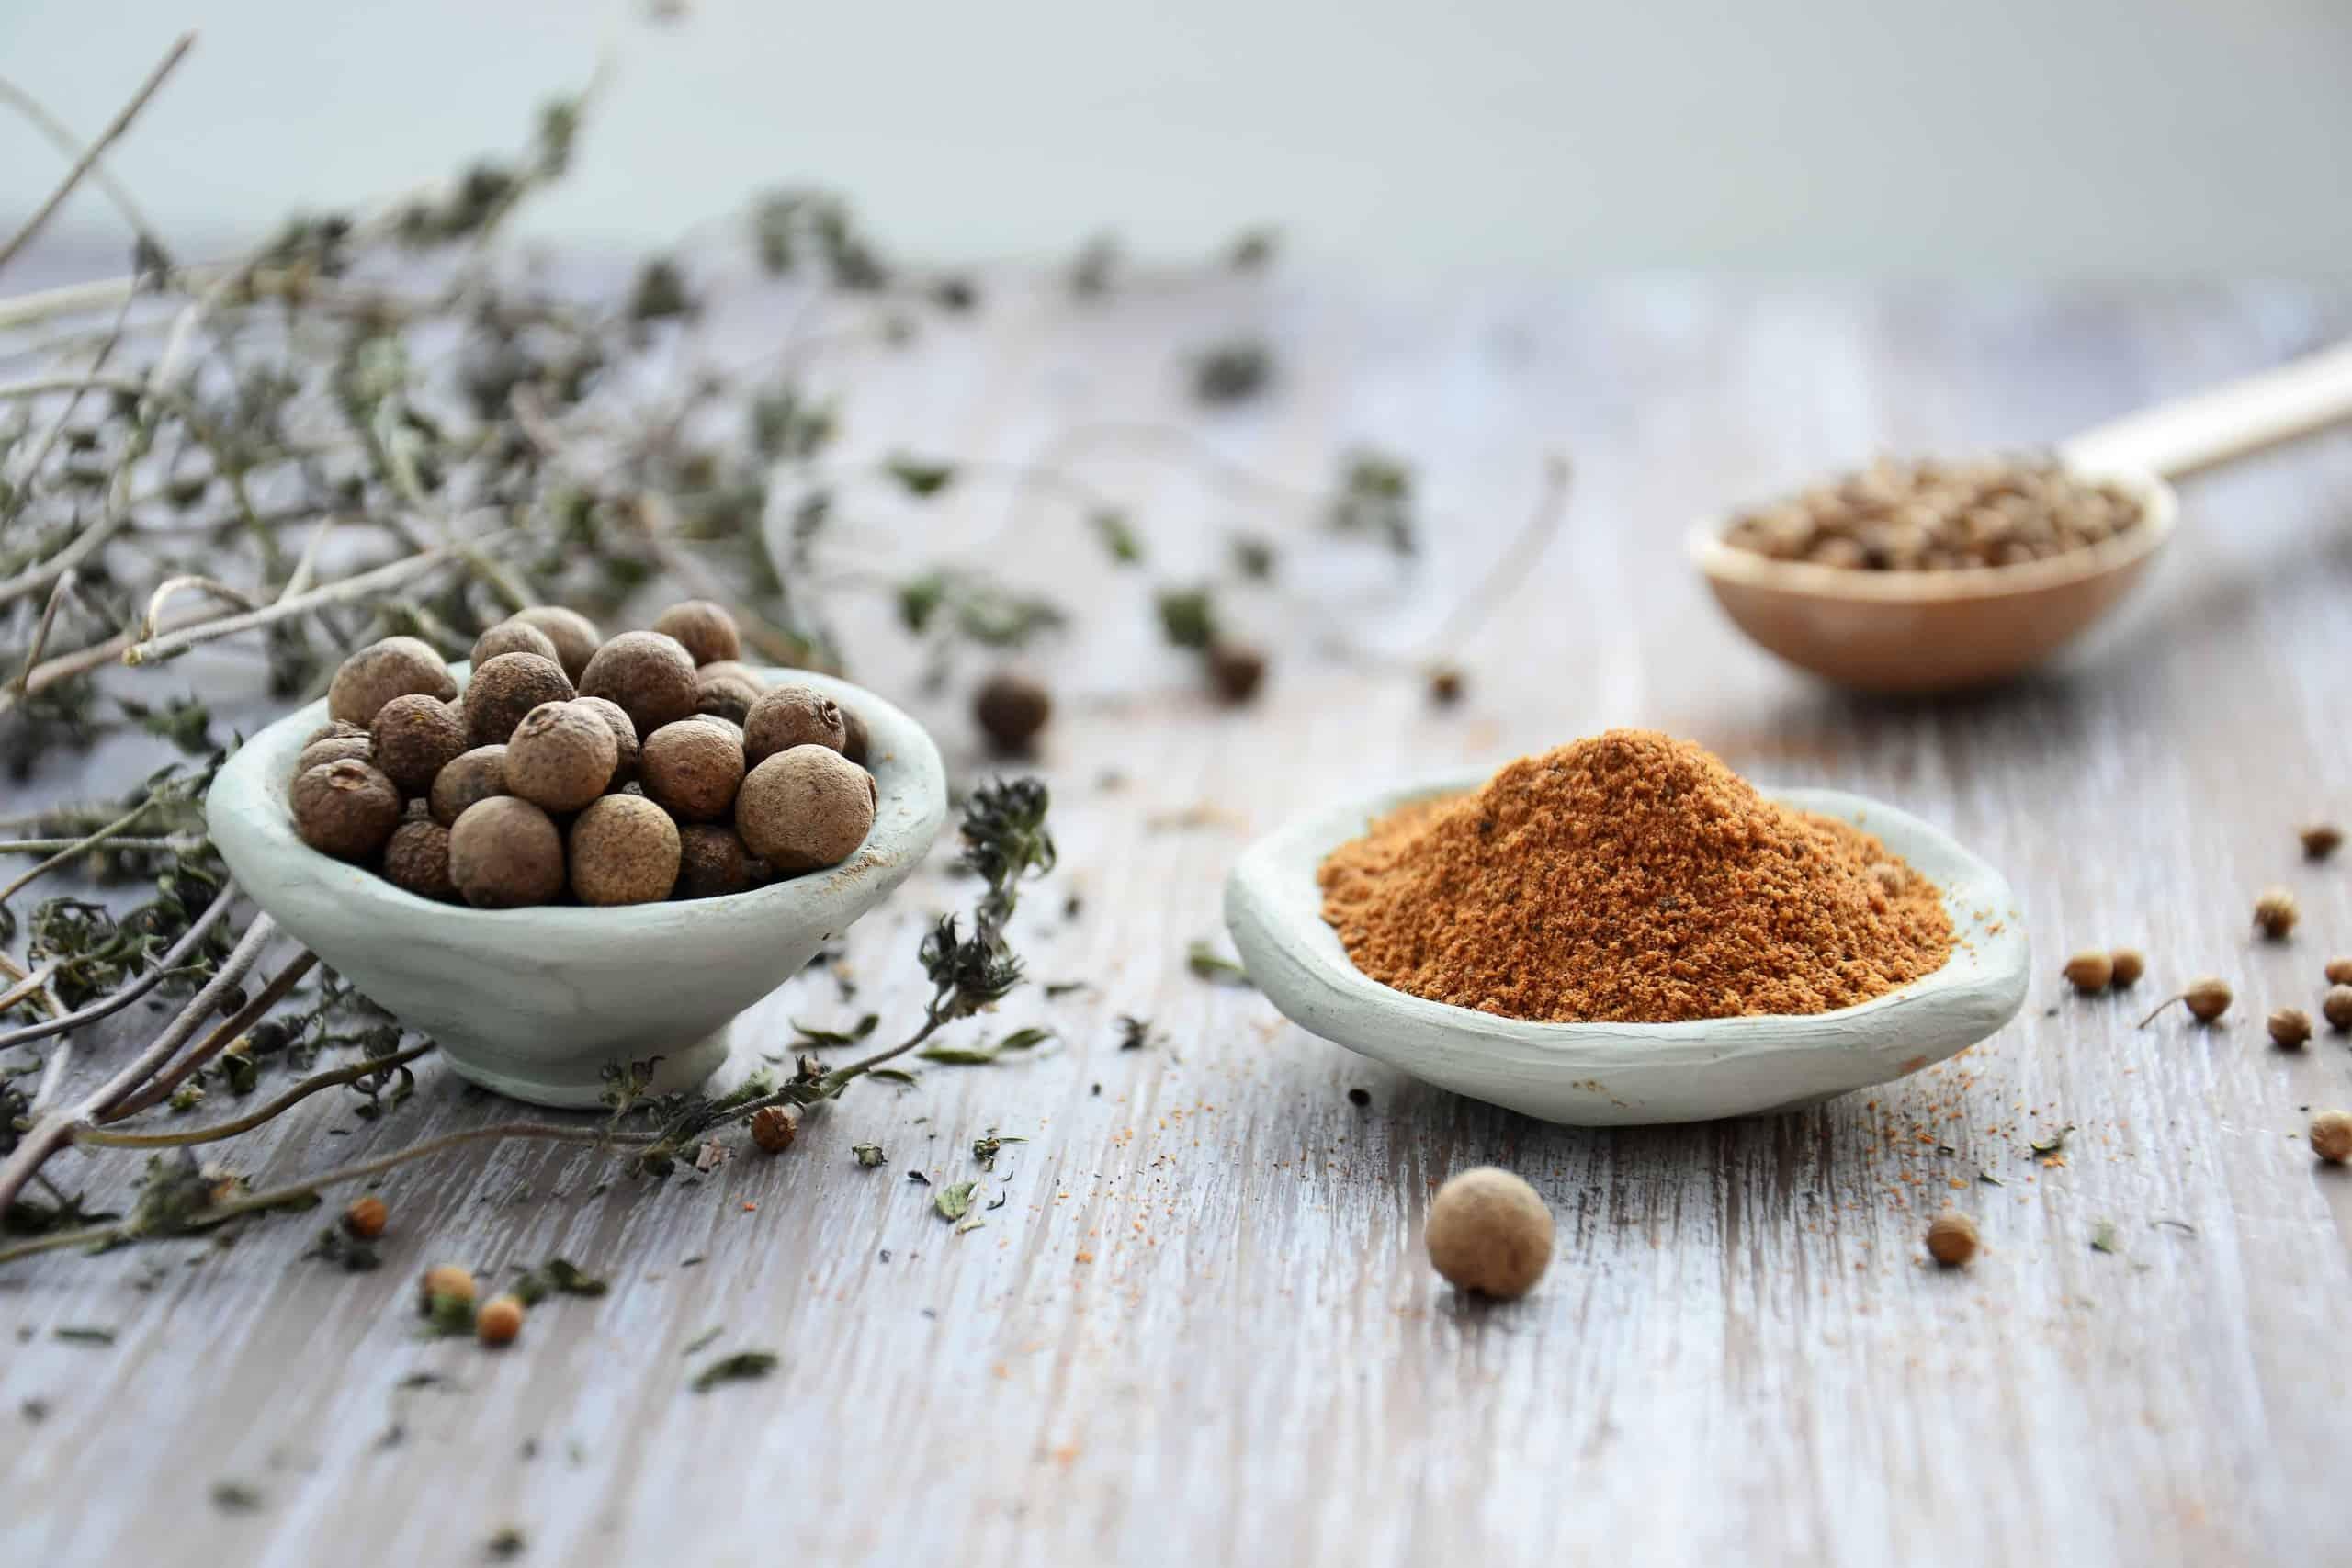 Agni Aid Spice Mix - the Art of Living Retreat Center